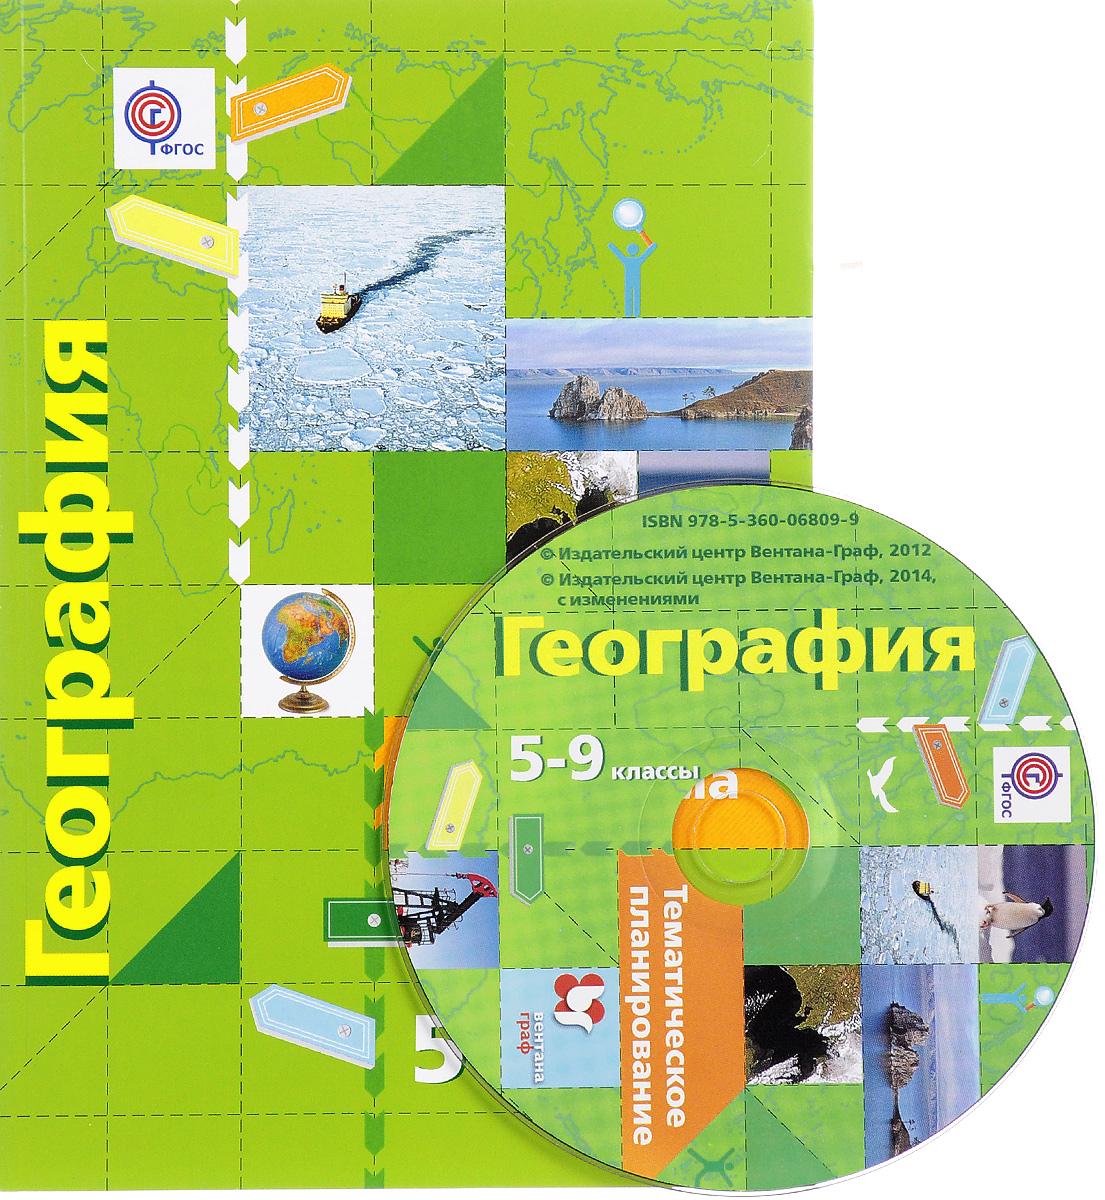 ЛетягинА.А., ДушинаИ.В., ПятунинВ.Б., ТаможняяЕ.А. География. 5-9 классы. Программа (+ CD) таможняя